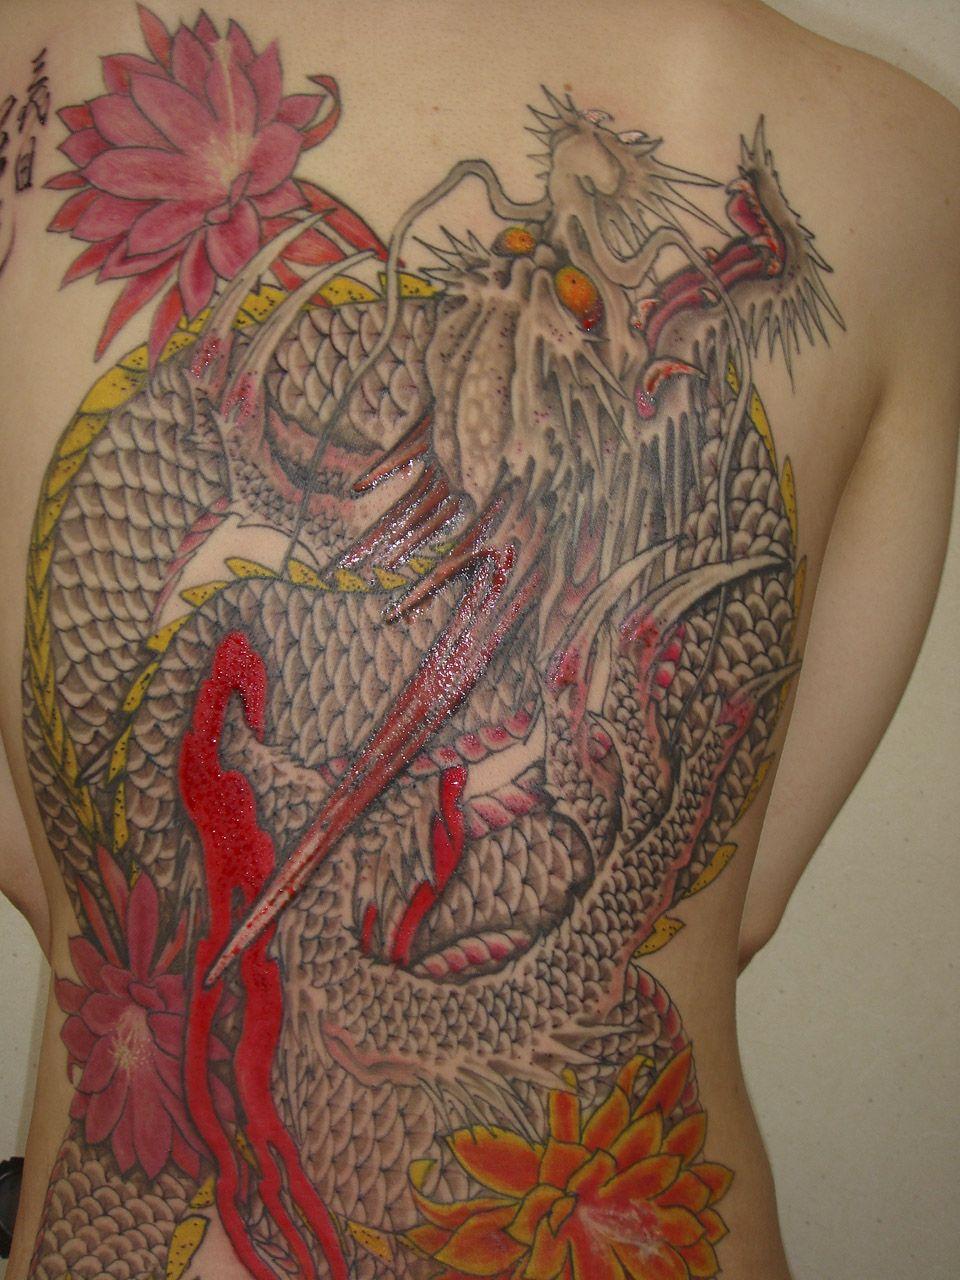 Obra de tatuaje Irezumi de espalda completa del maestro Horiyoshi.